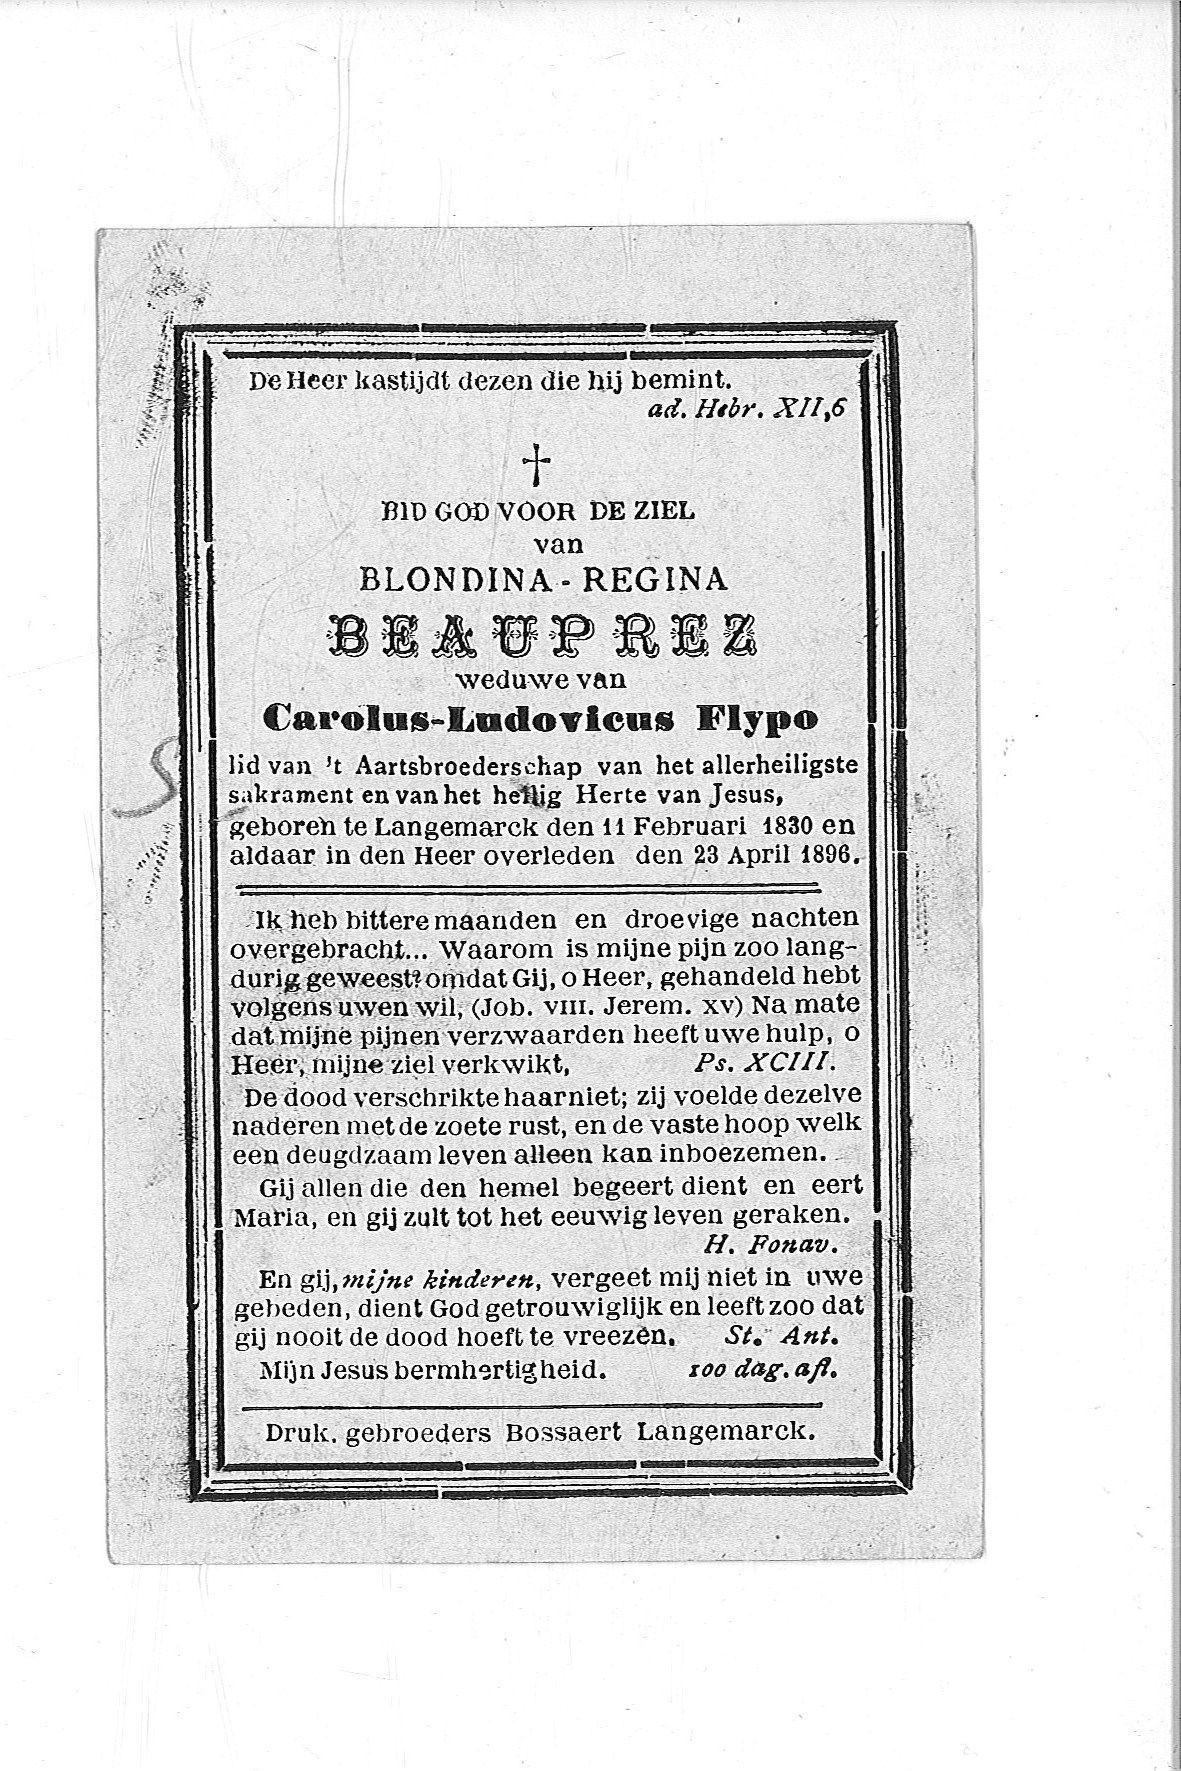 Blondina-Regina(1897)20090806155105_00035.jpg